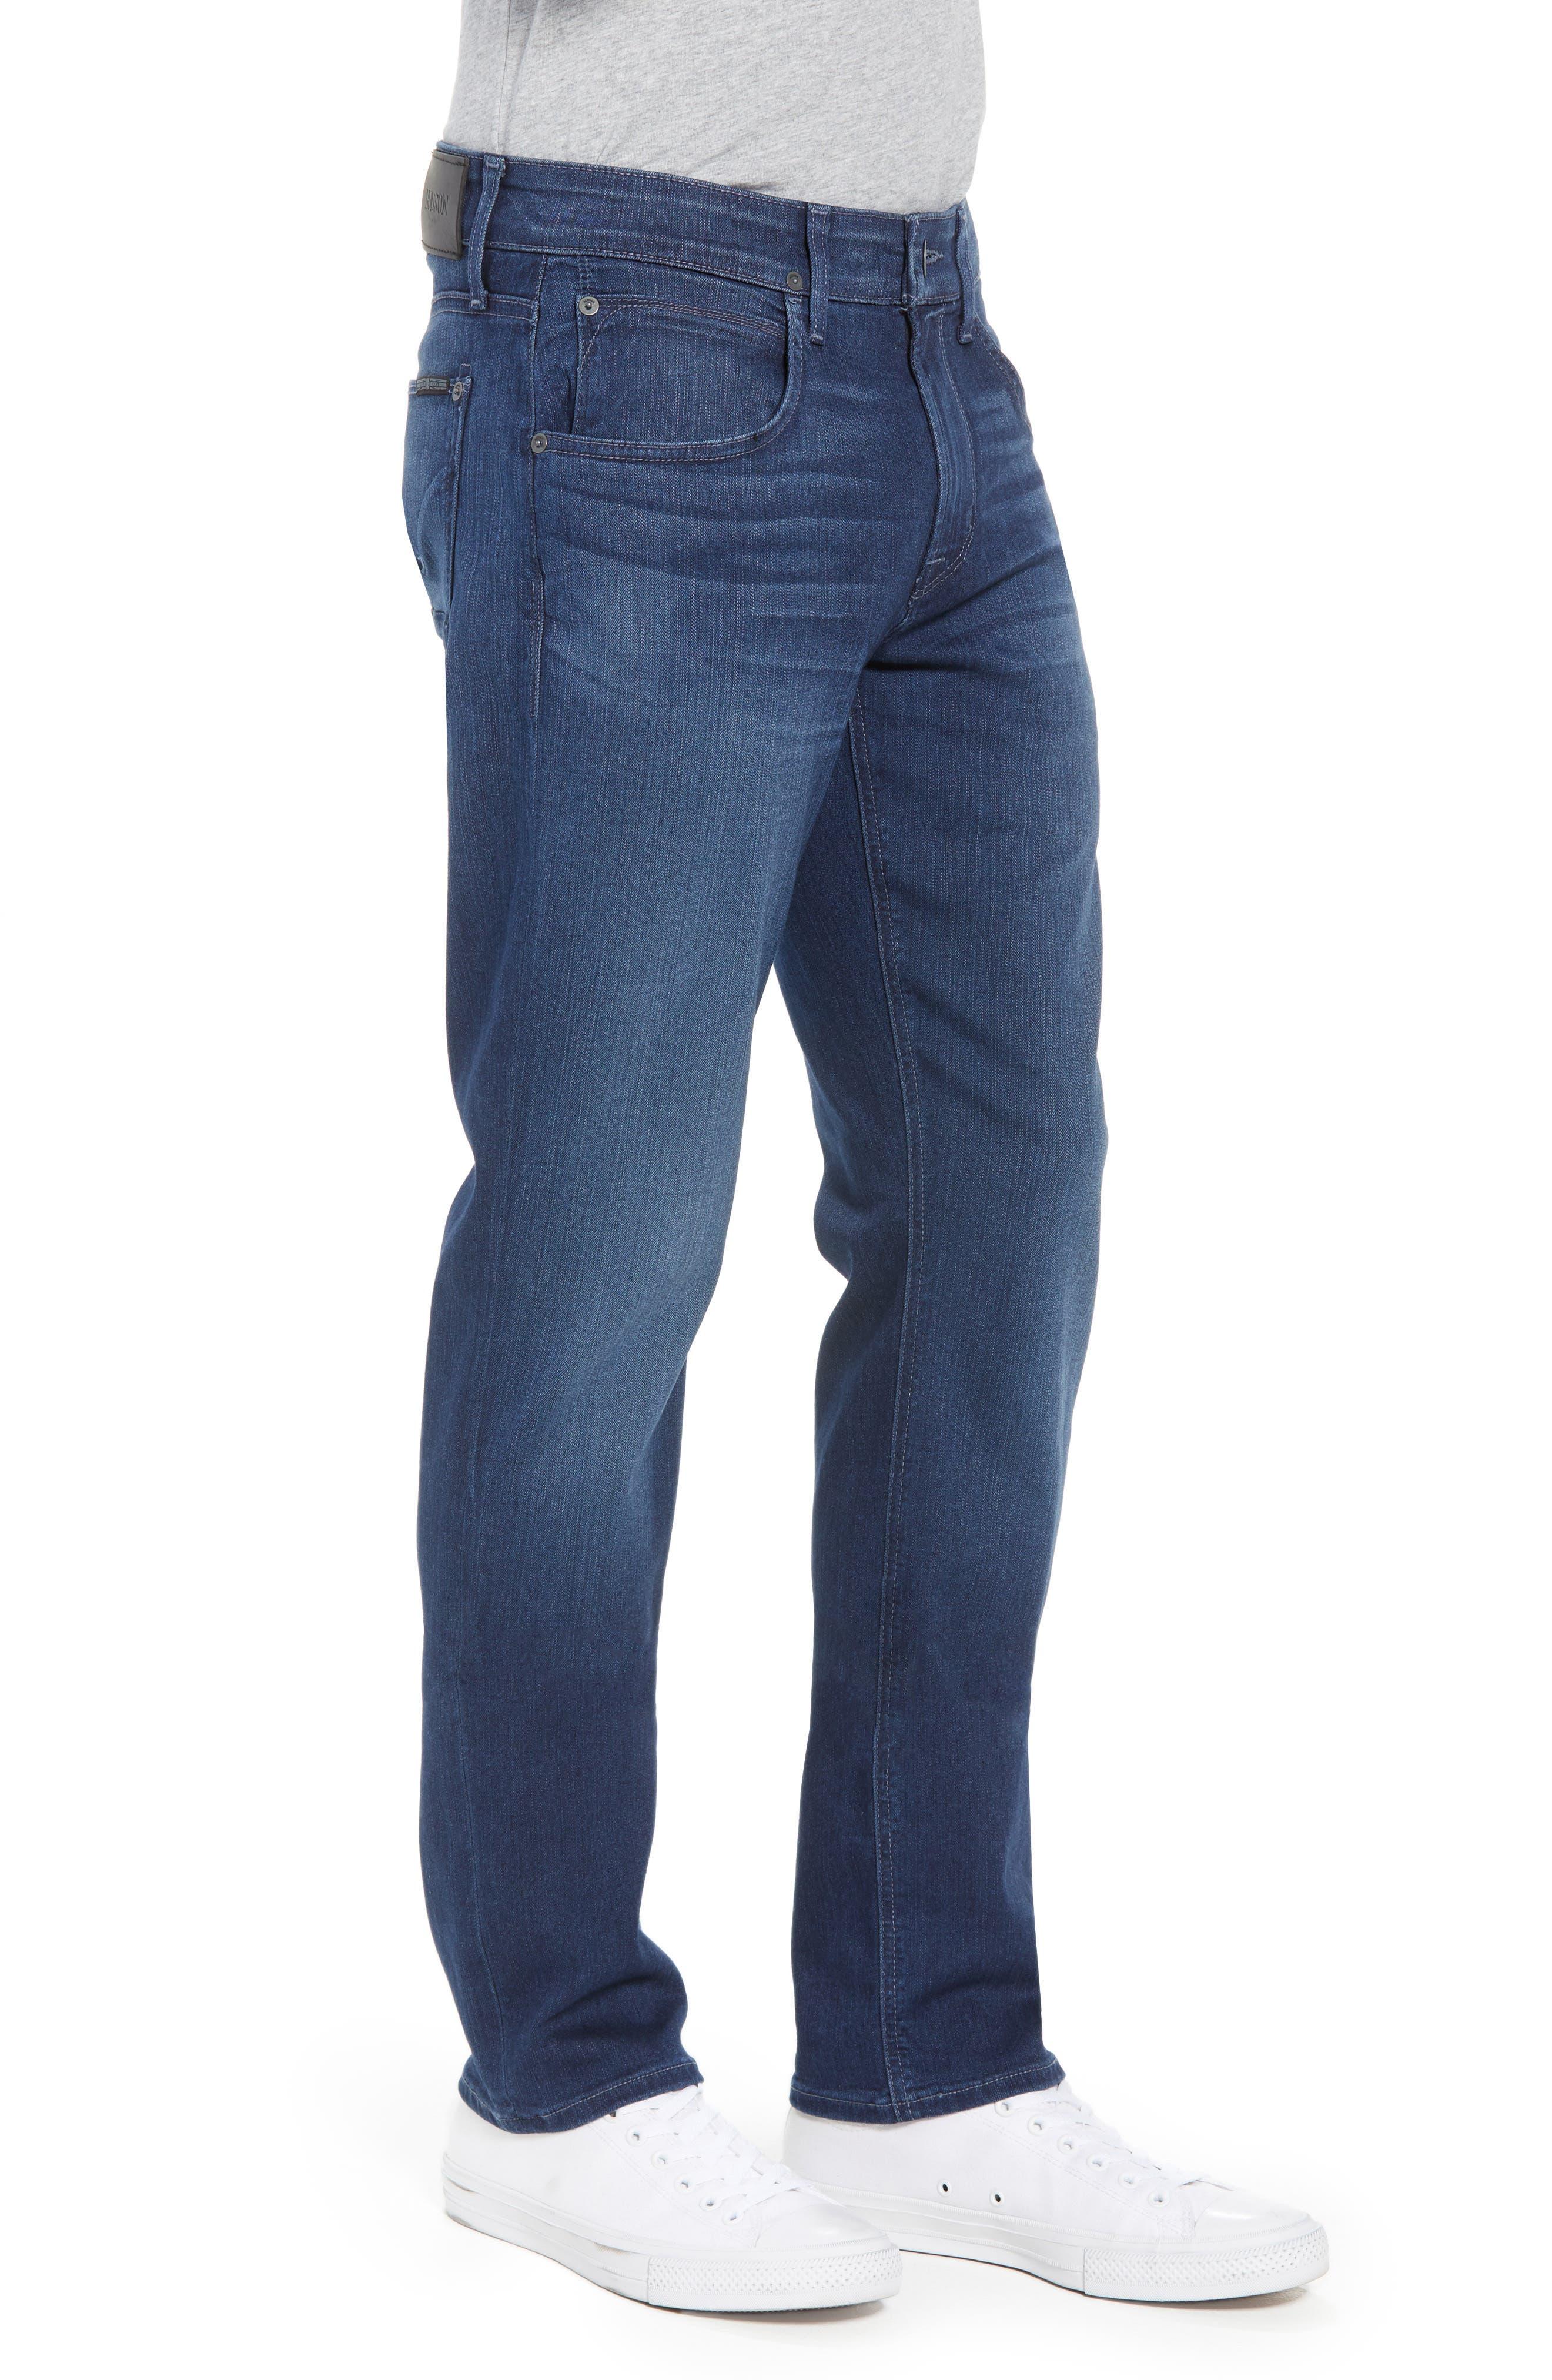 Byron Slim Straight Leg Jeans,                             Alternate thumbnail 3, color,                             403